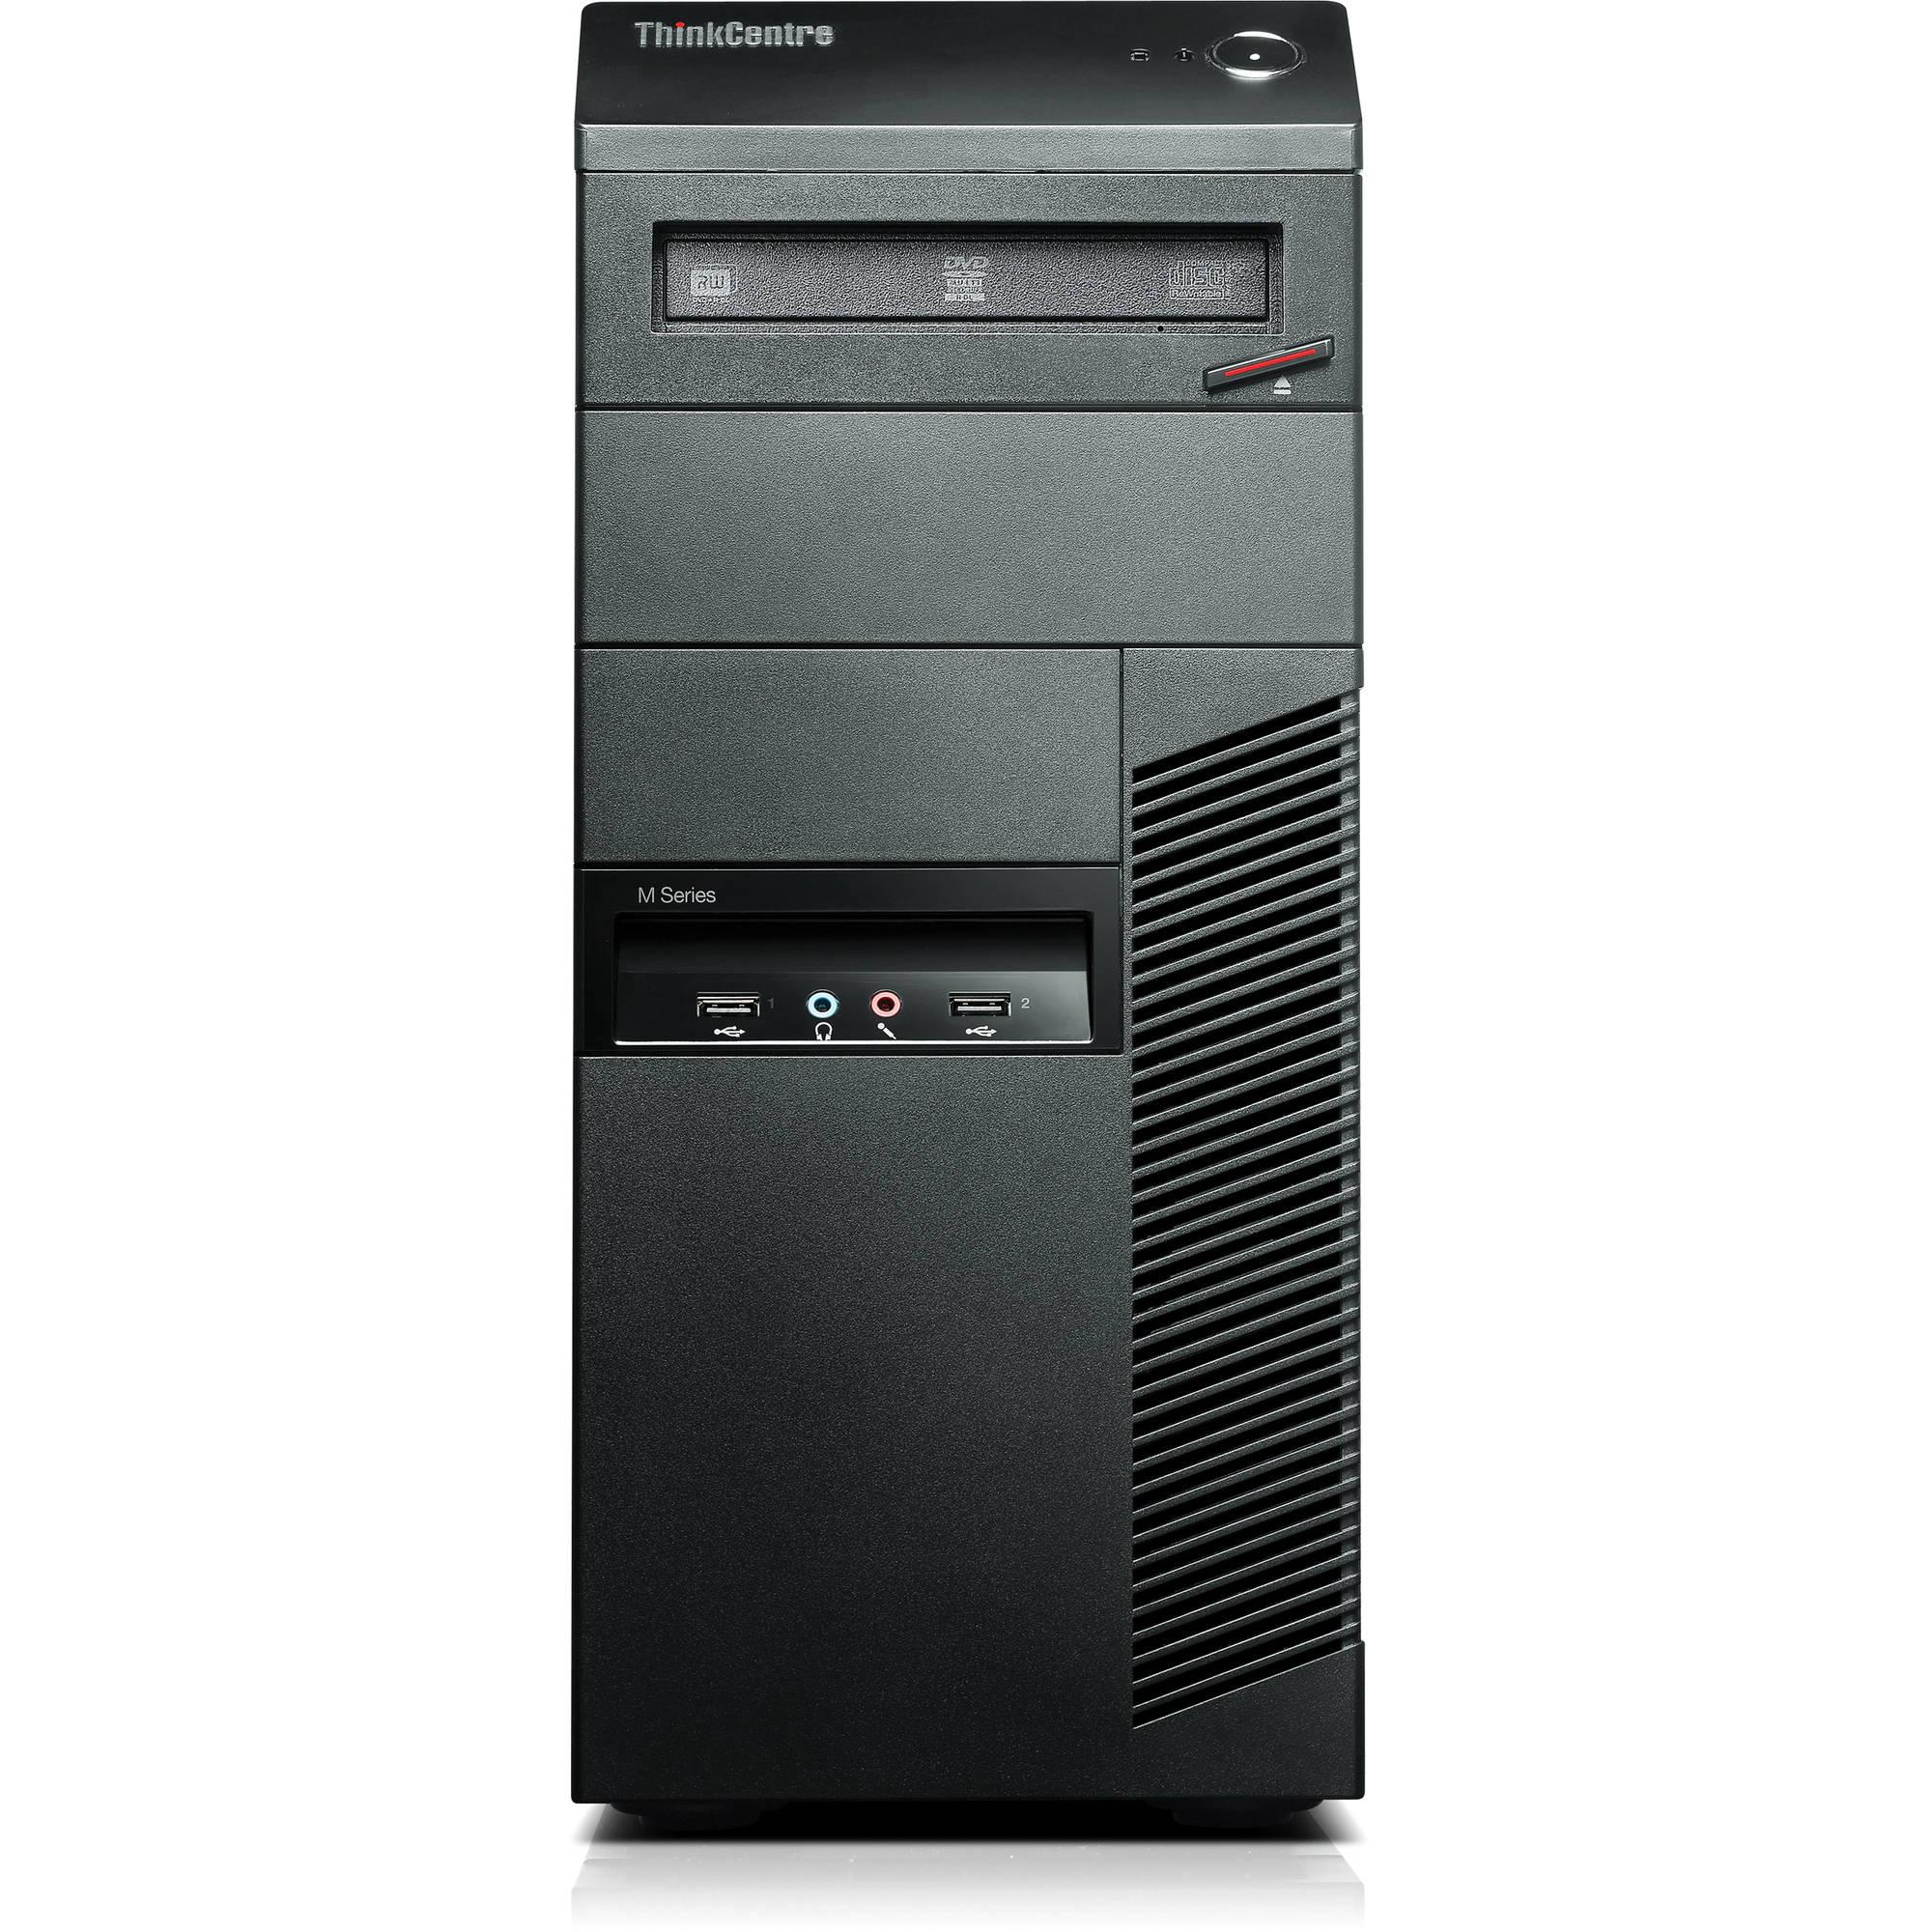 Lenovo ThinkCentre M91 ATI HD5450 Display Driver